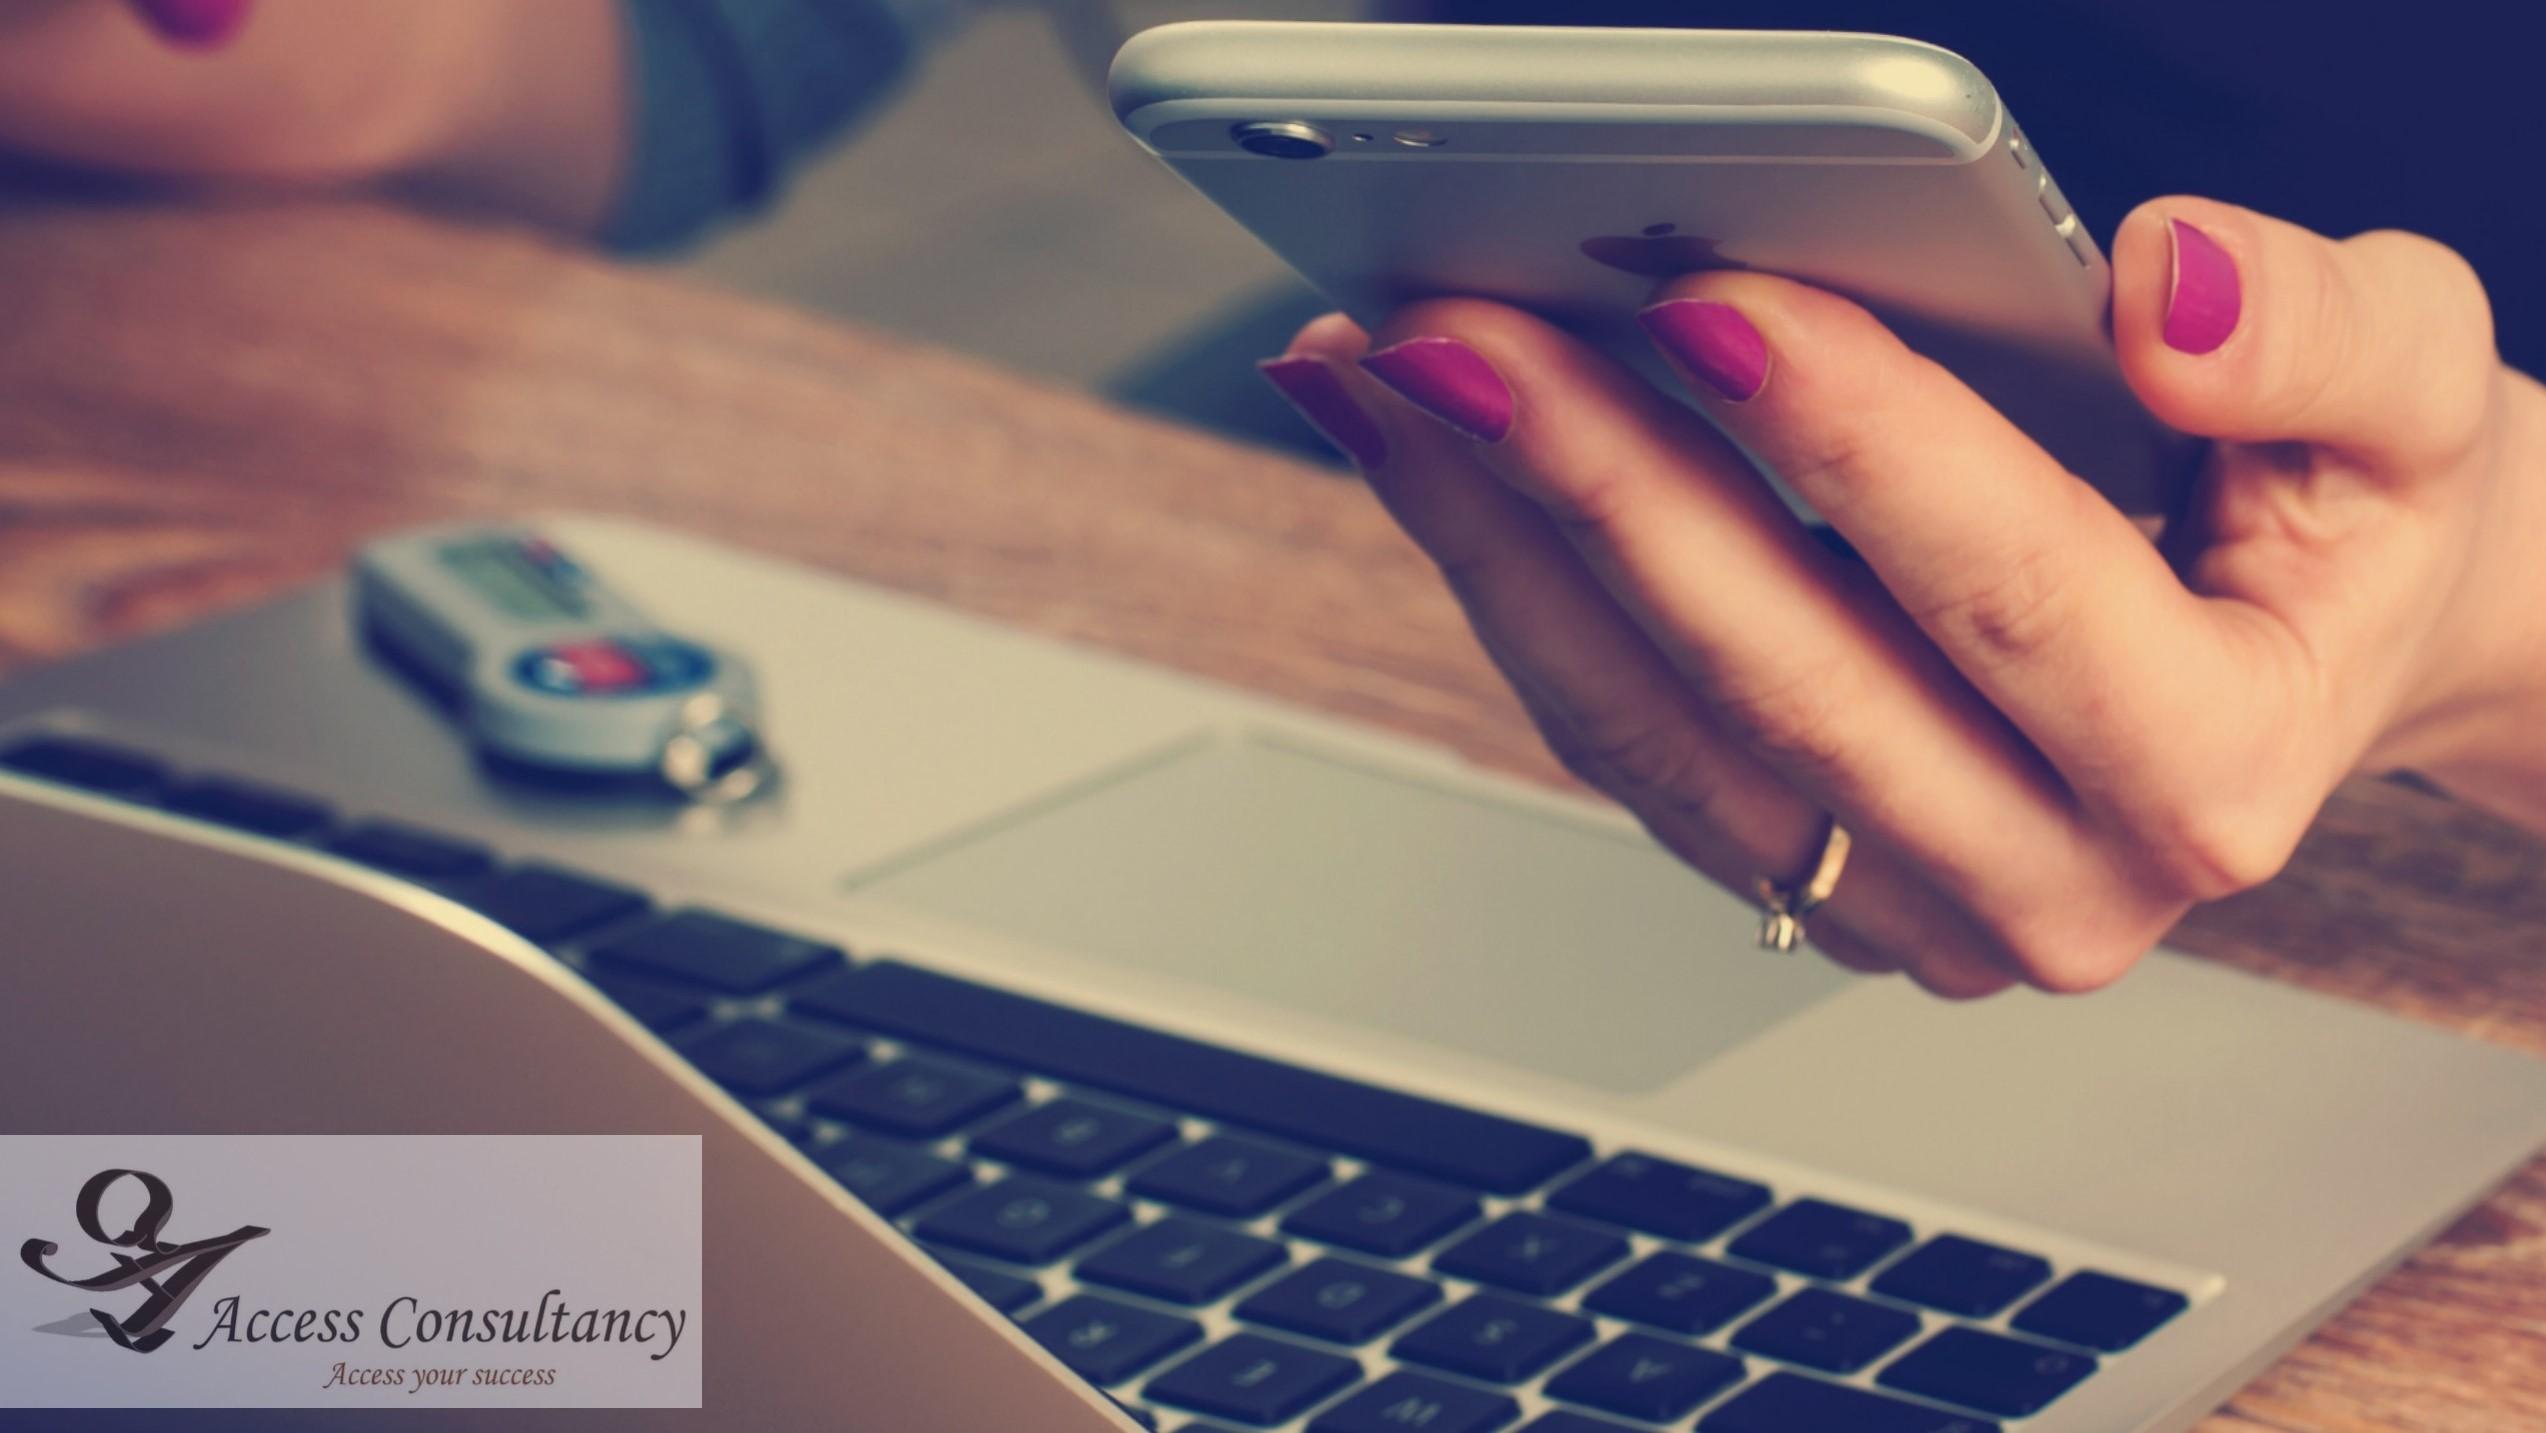 Access Consultancy's new service : On-demand Recruitment service